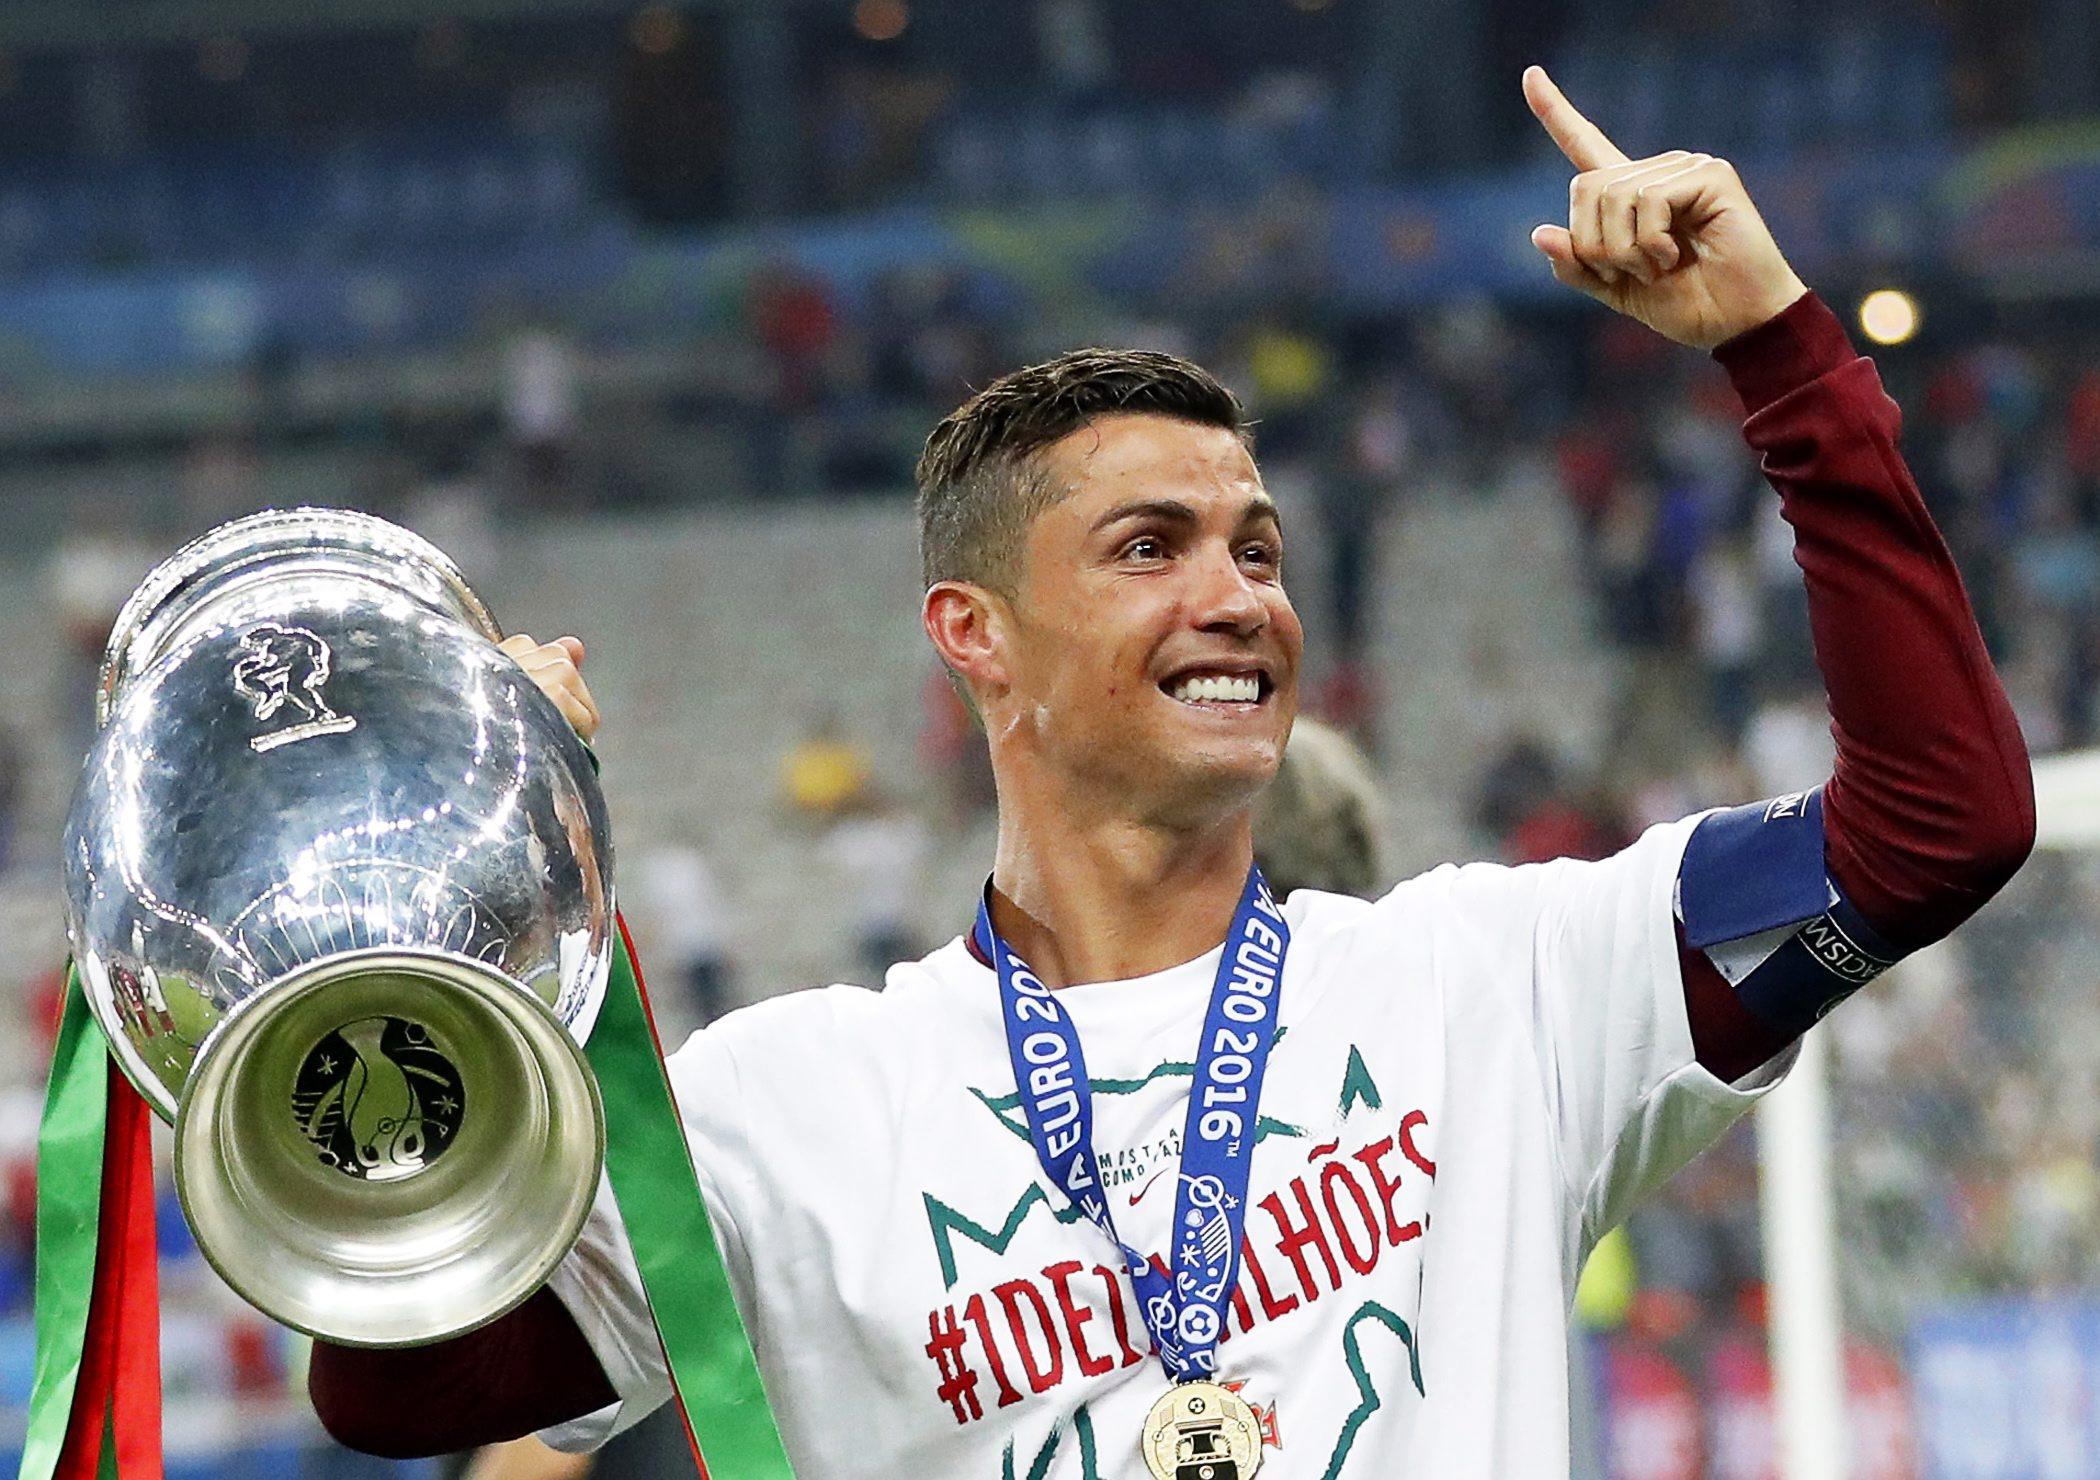 C罗举起德劳内杯,这也是葡萄牙队史上的第一座重大赛事的冠军。